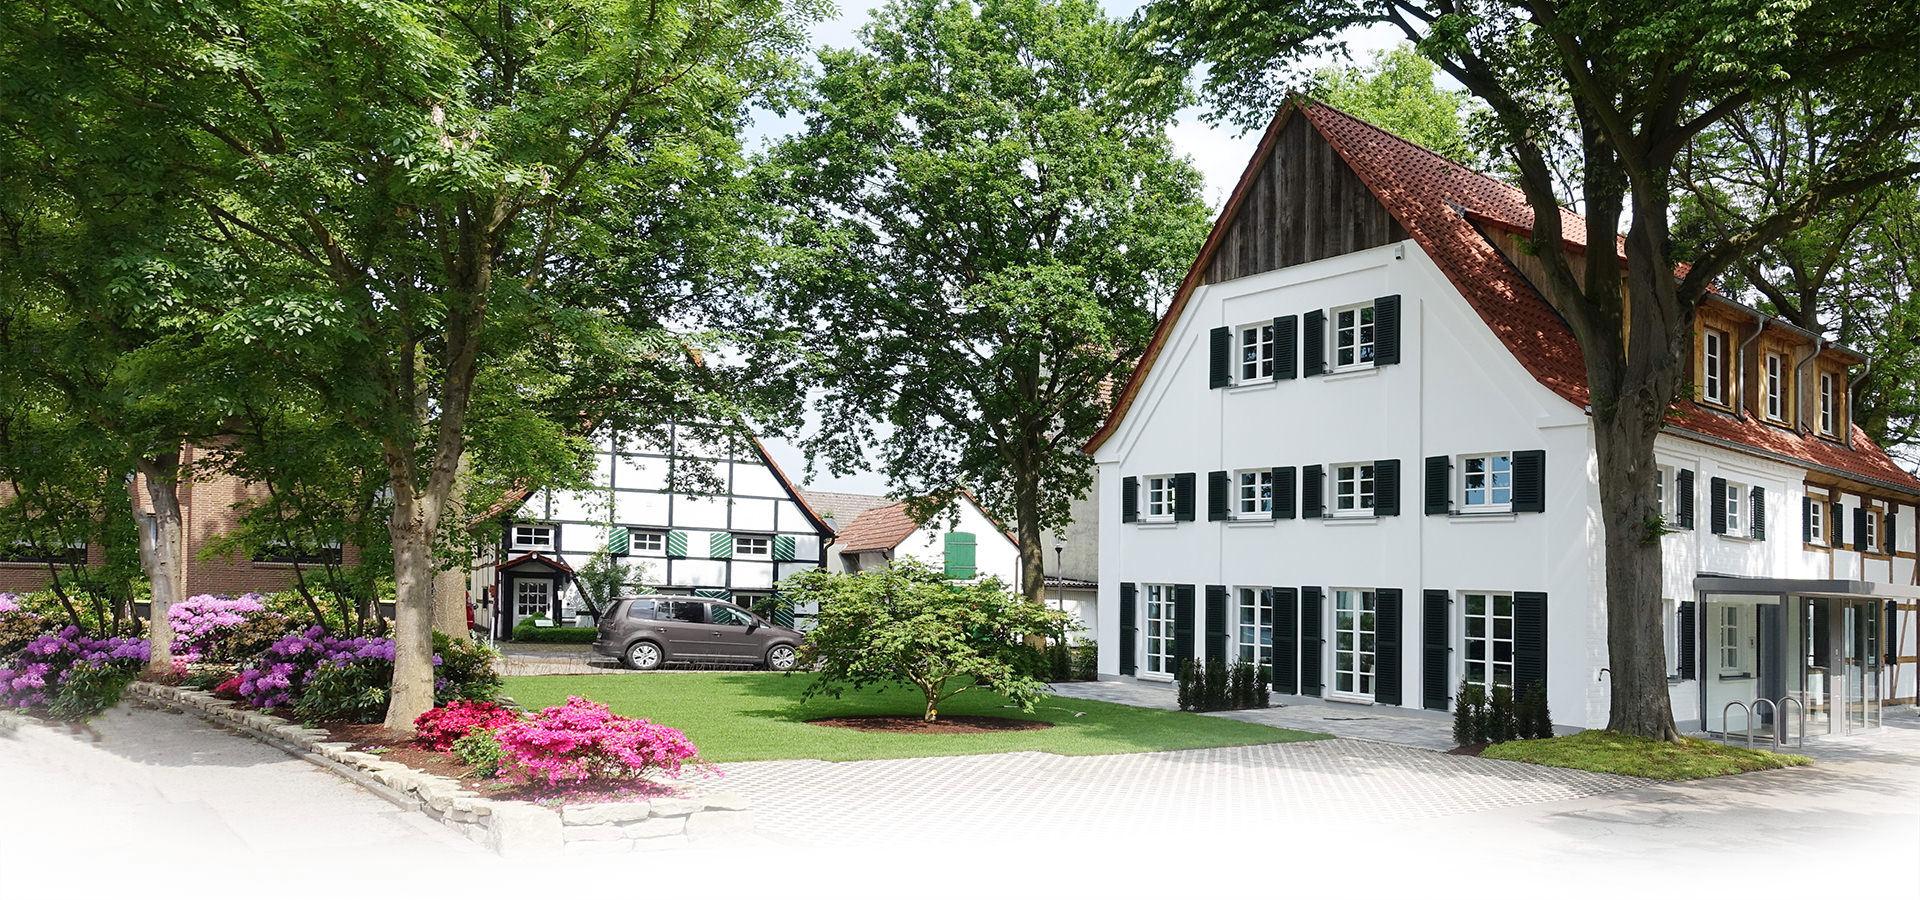 Altes Lehrerhaus Lünern